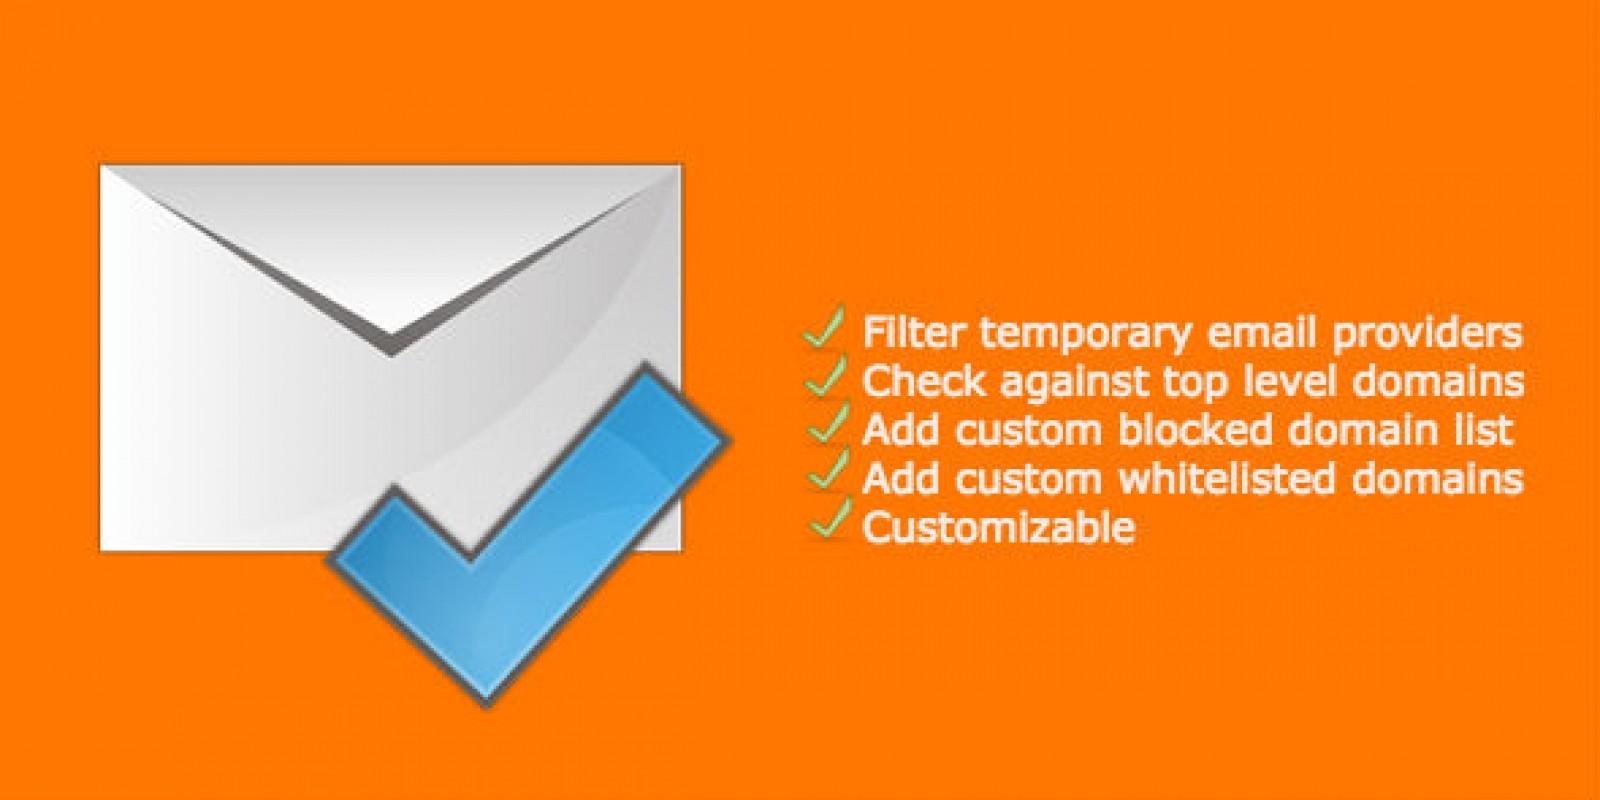 Vue JS Email Validation Component